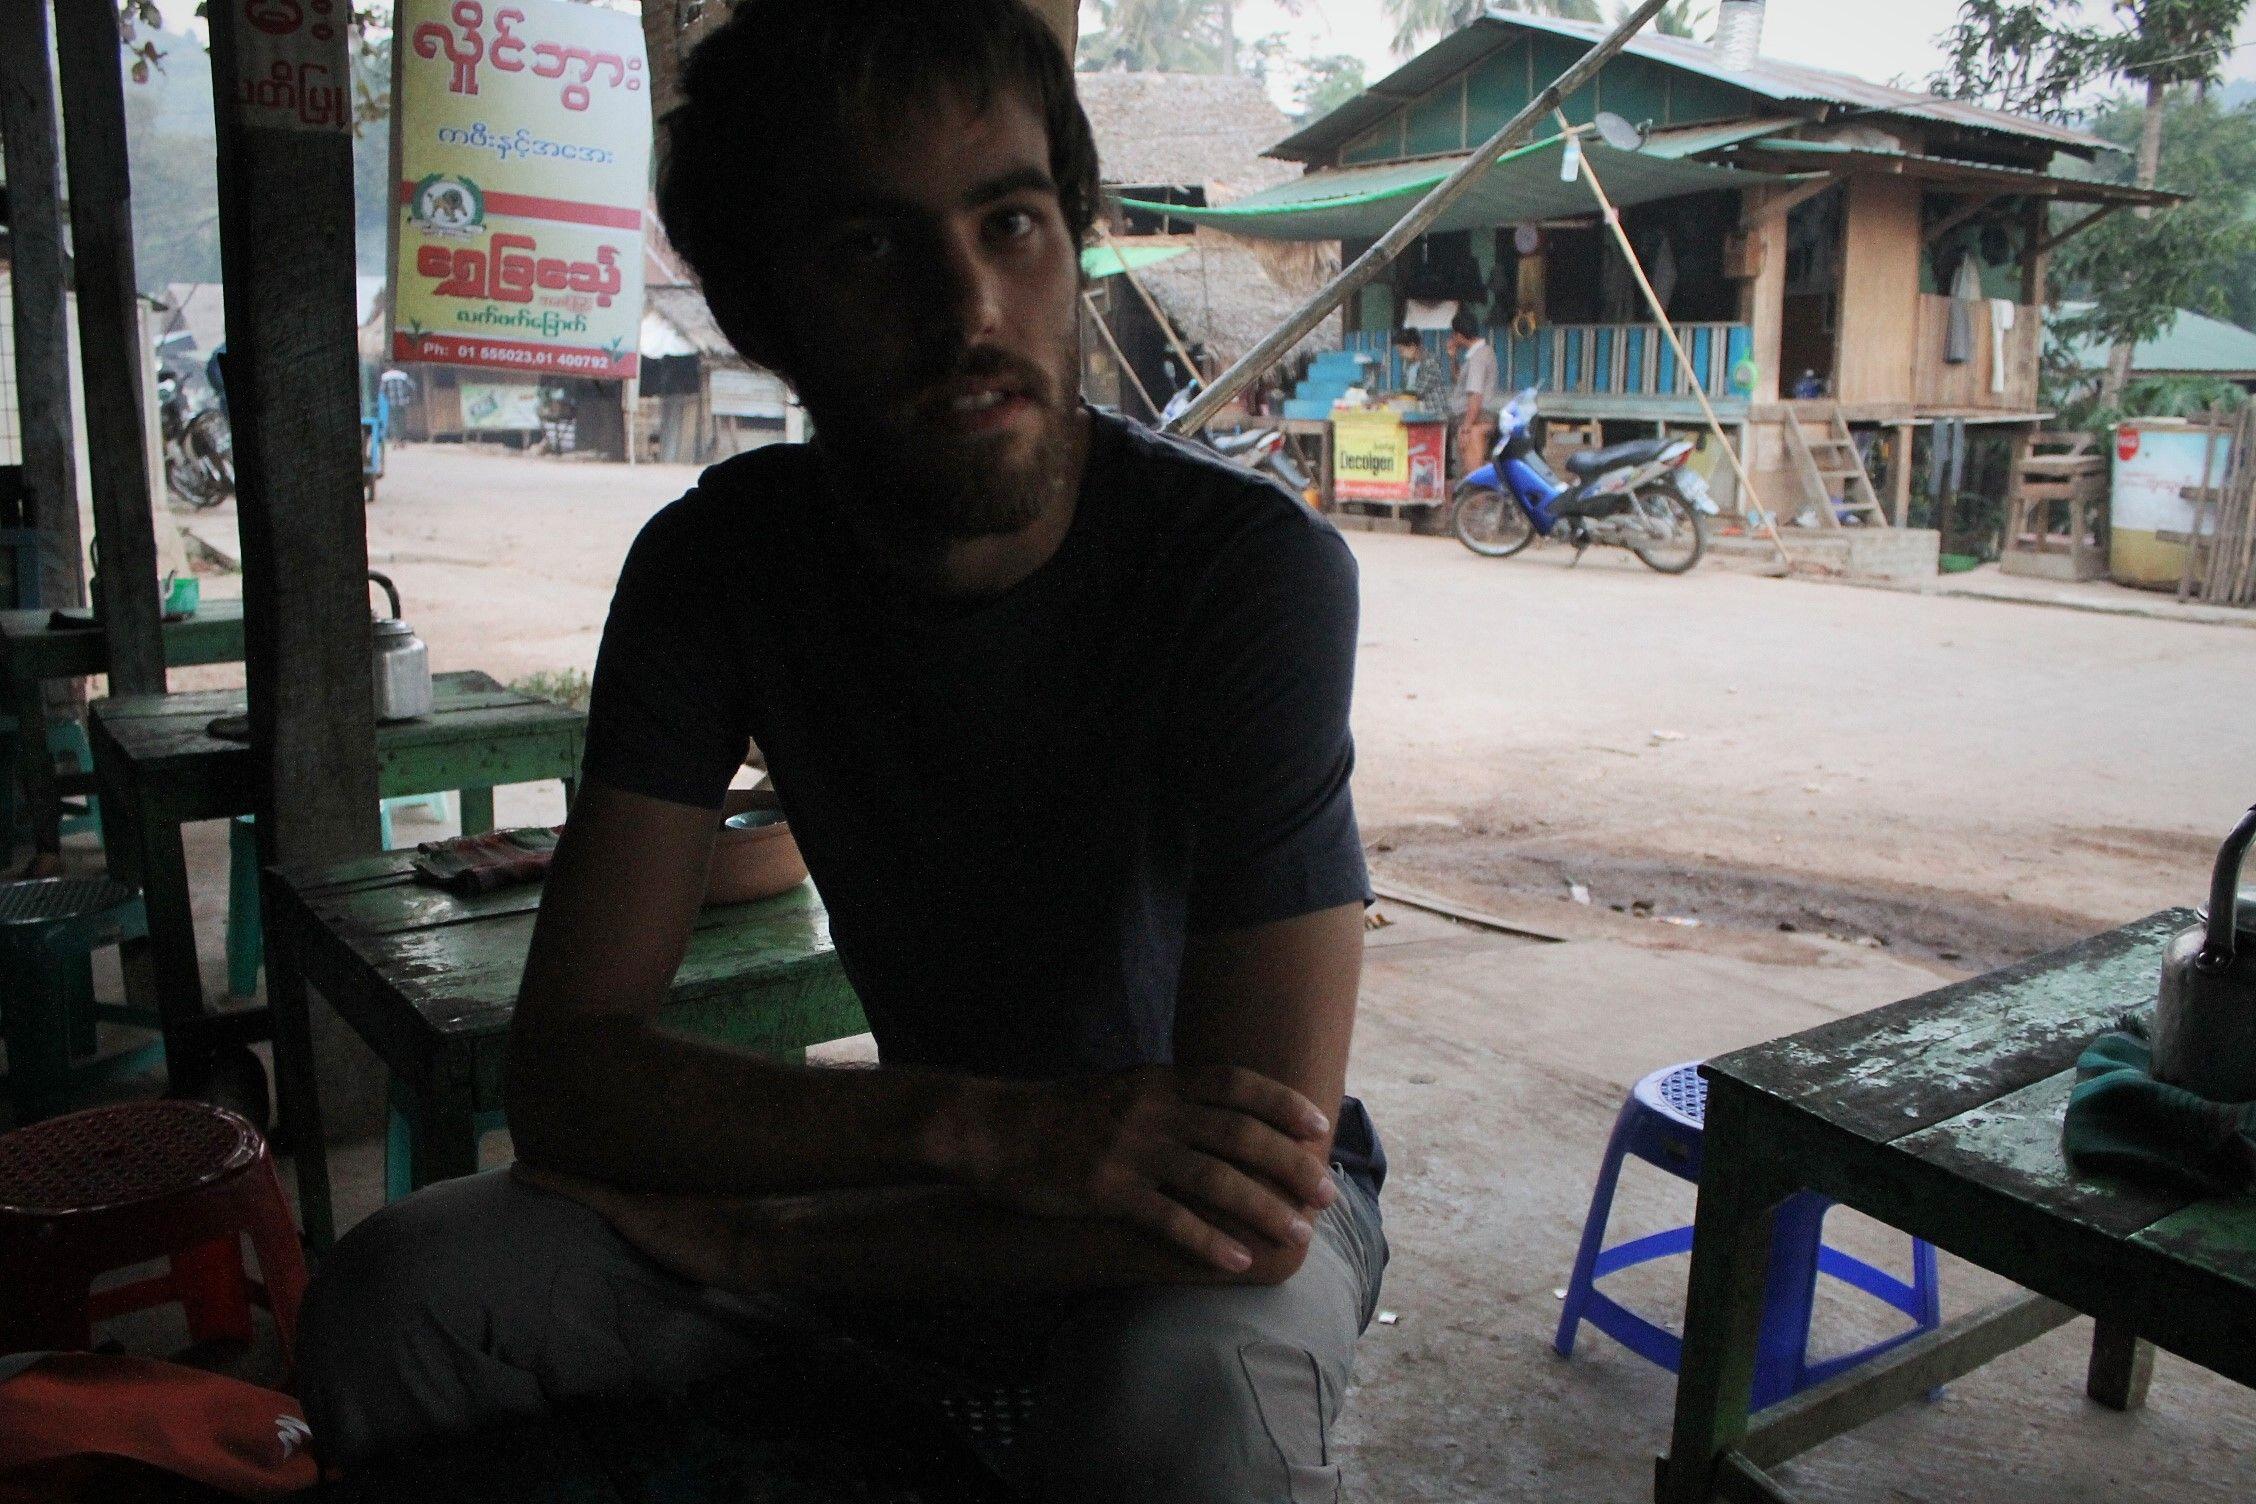 En una casa de té en Kinpun.Dani esa silla te va pequeña!